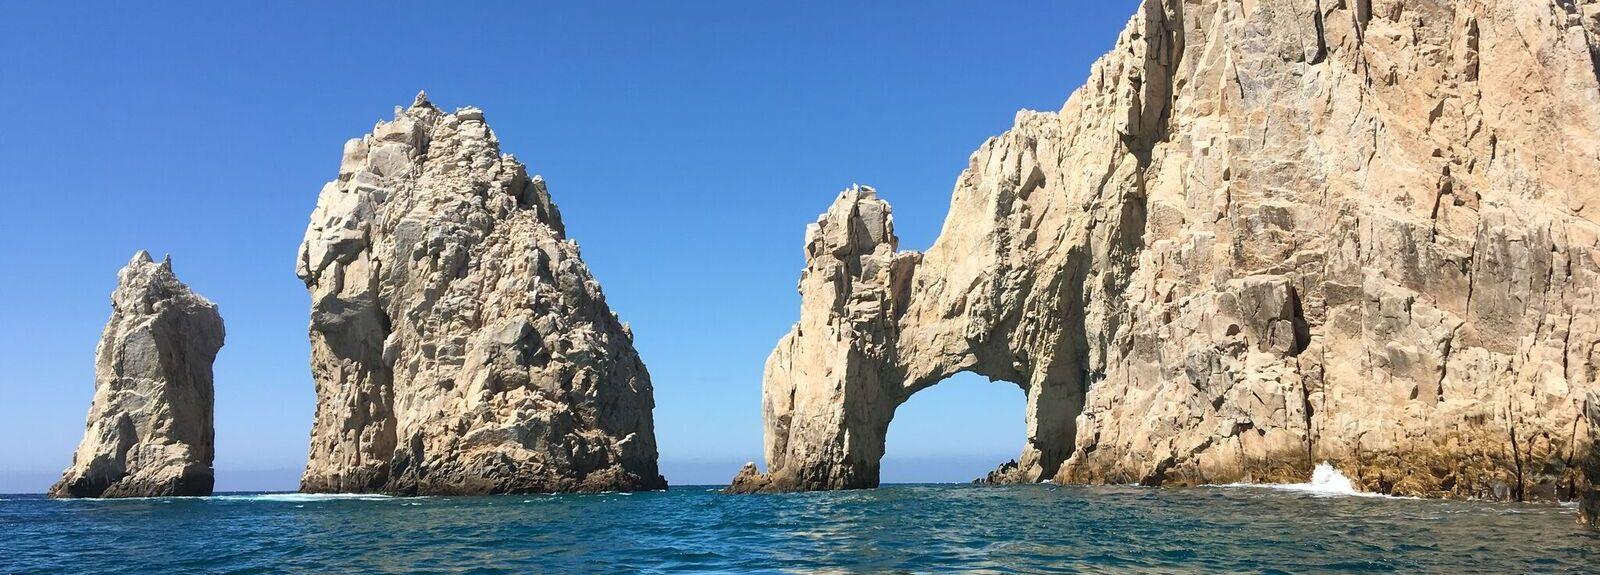 Hacienda Beach Club & Residences (Cabo San Lucas, Bassa California del Sud, Messico)